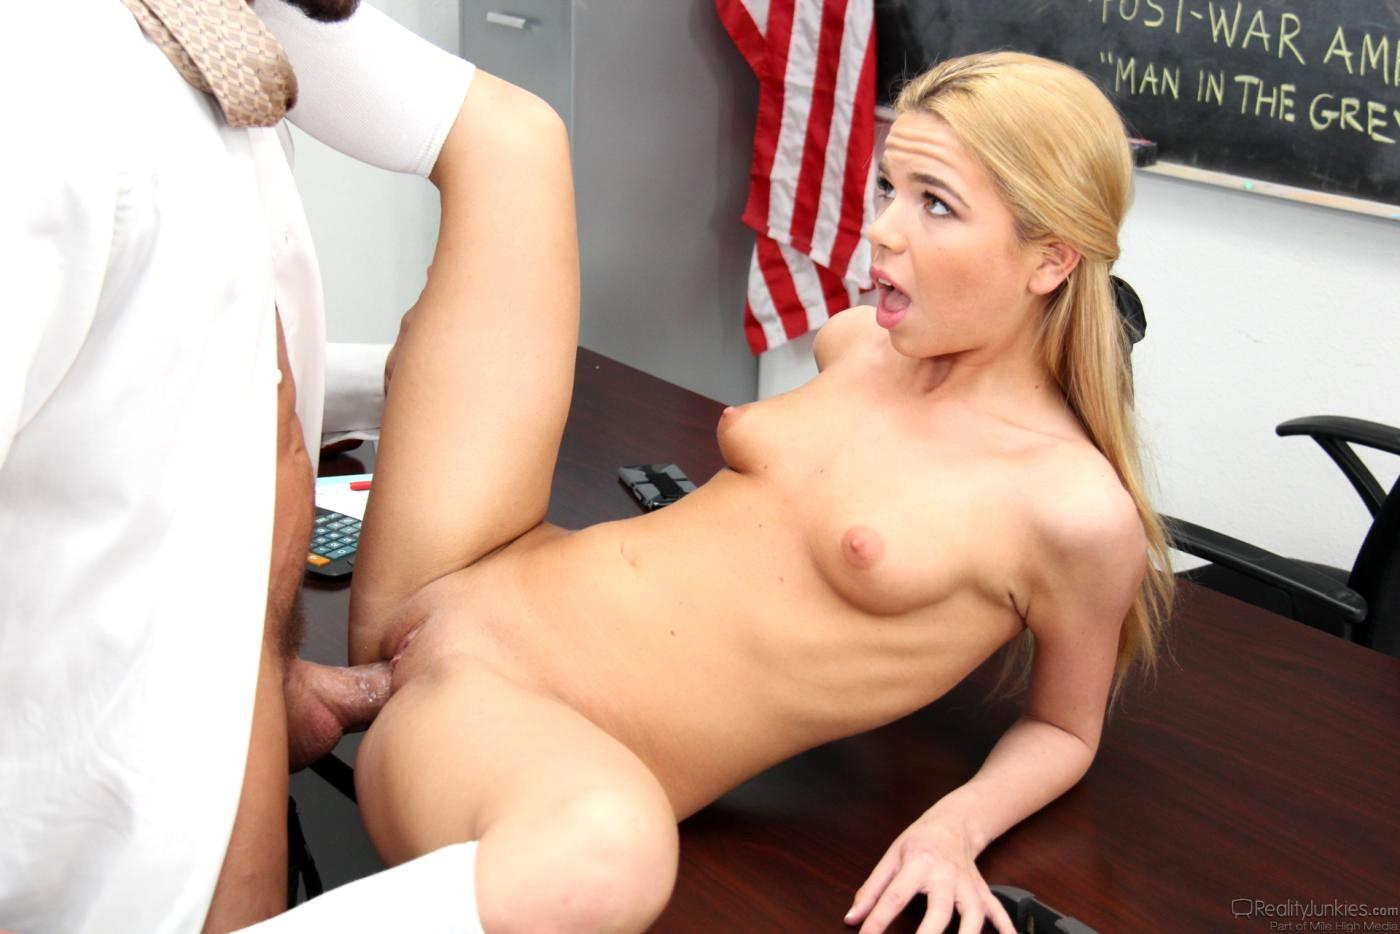 Tennage girl naked having a orgasim